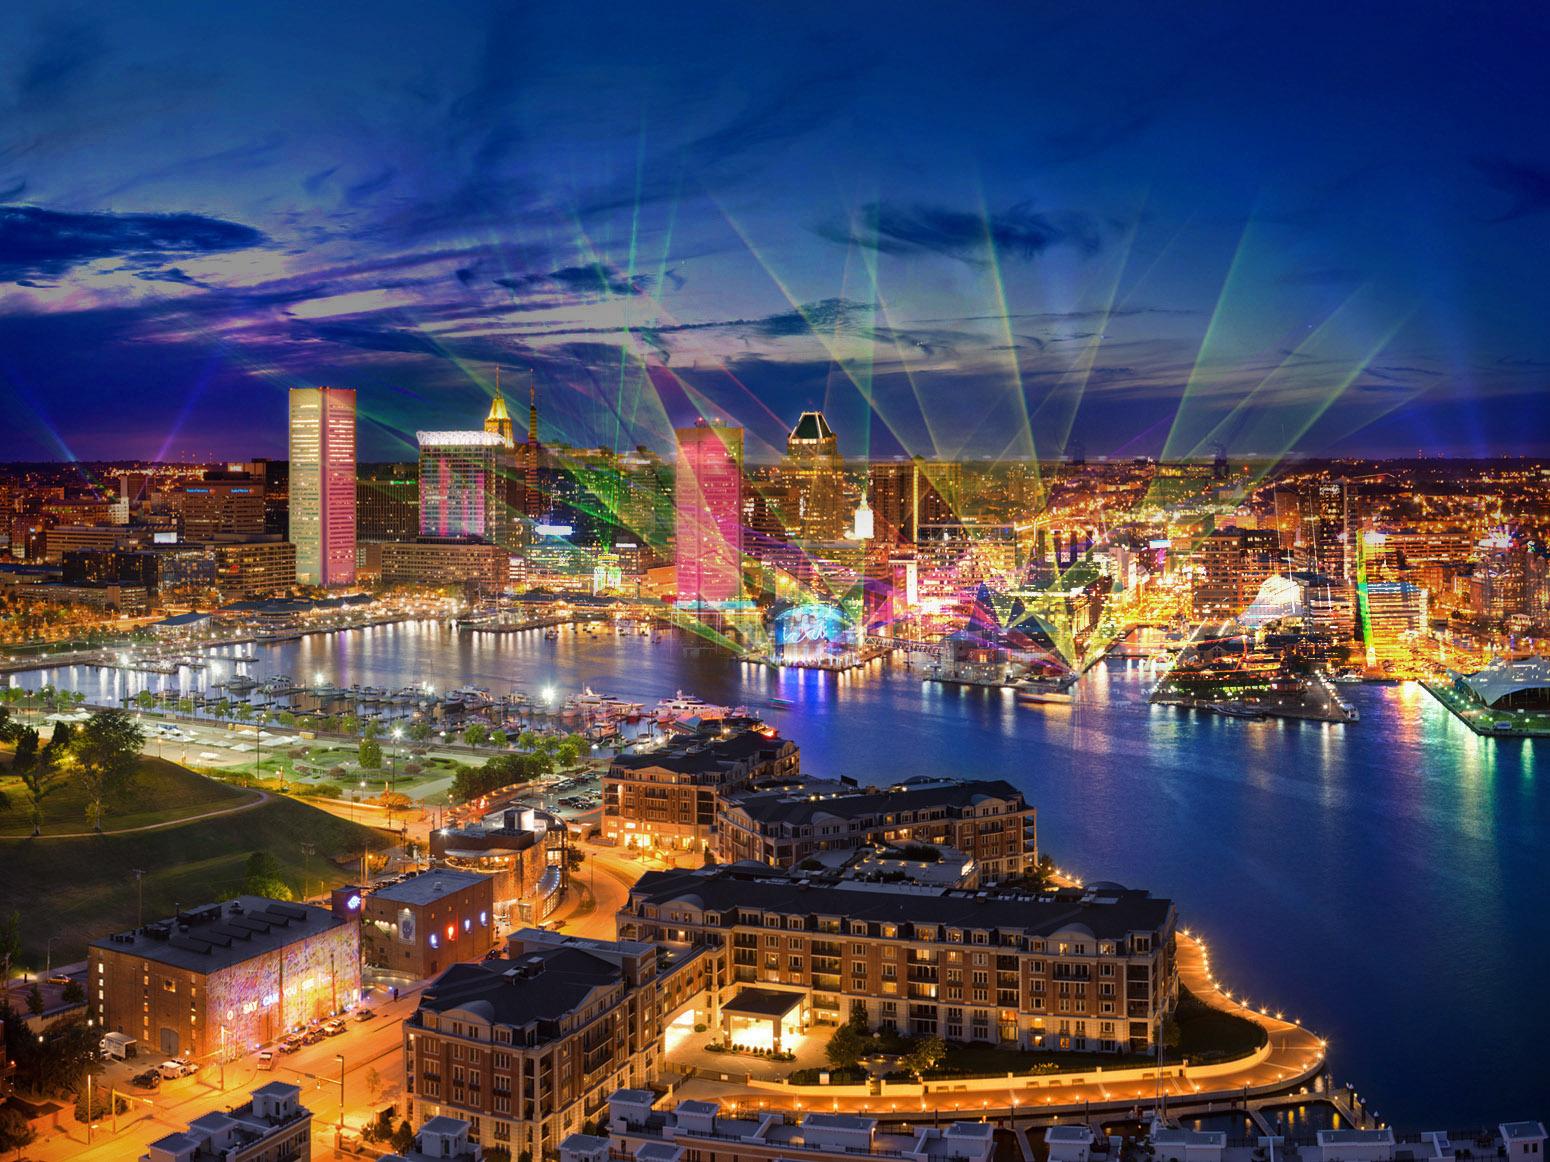 rendering-by-what-works-studio-Aerial-LightCity_Baltimore-night1.jpg